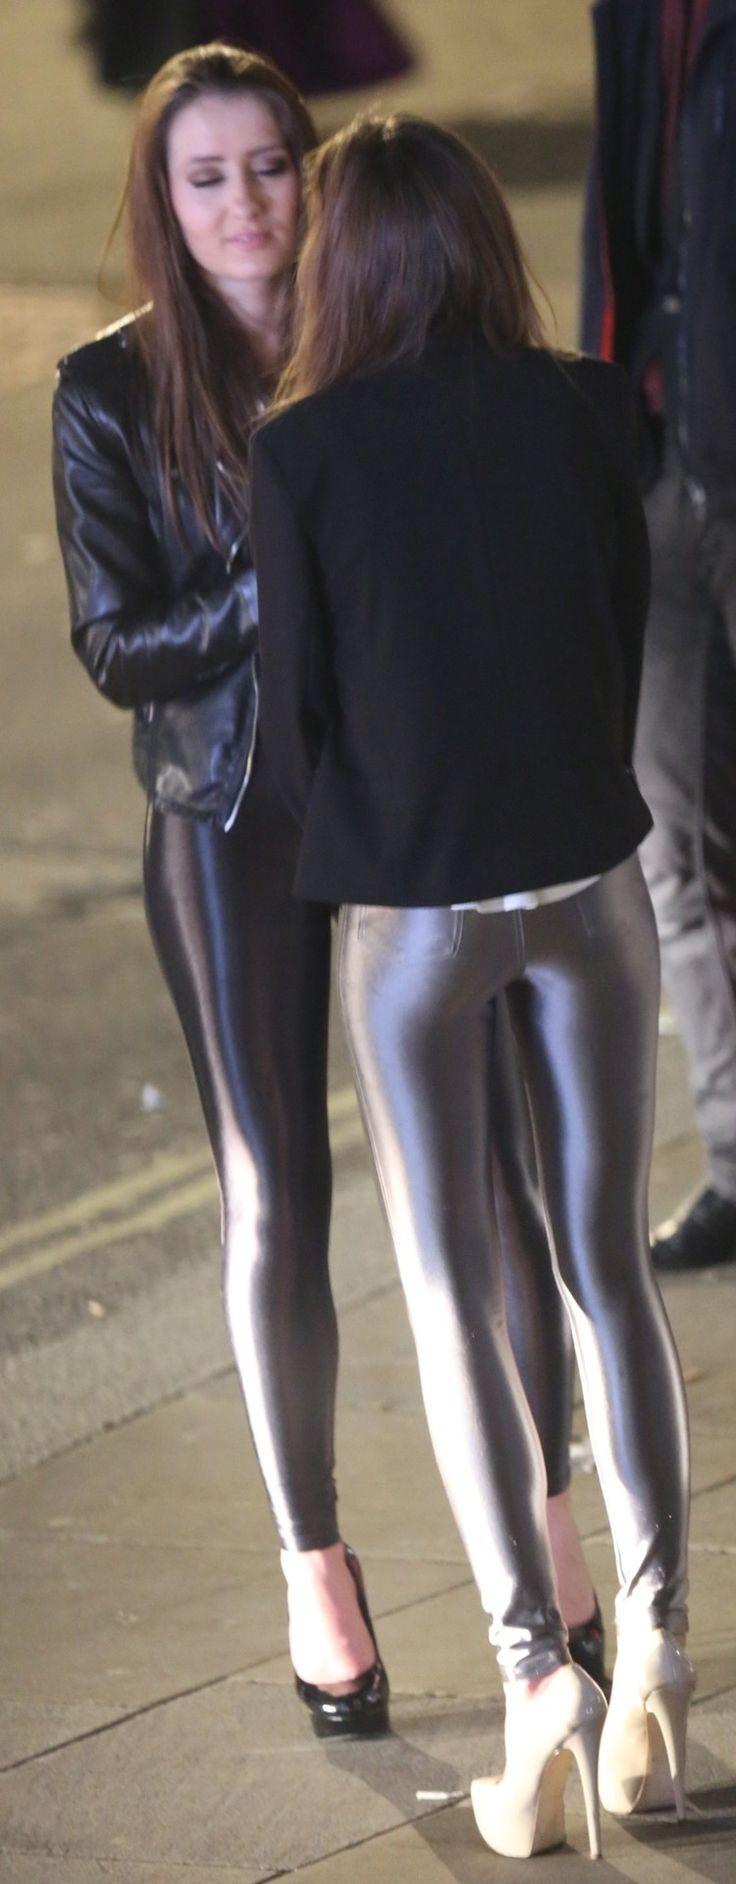 Yoga pants and heels bondage